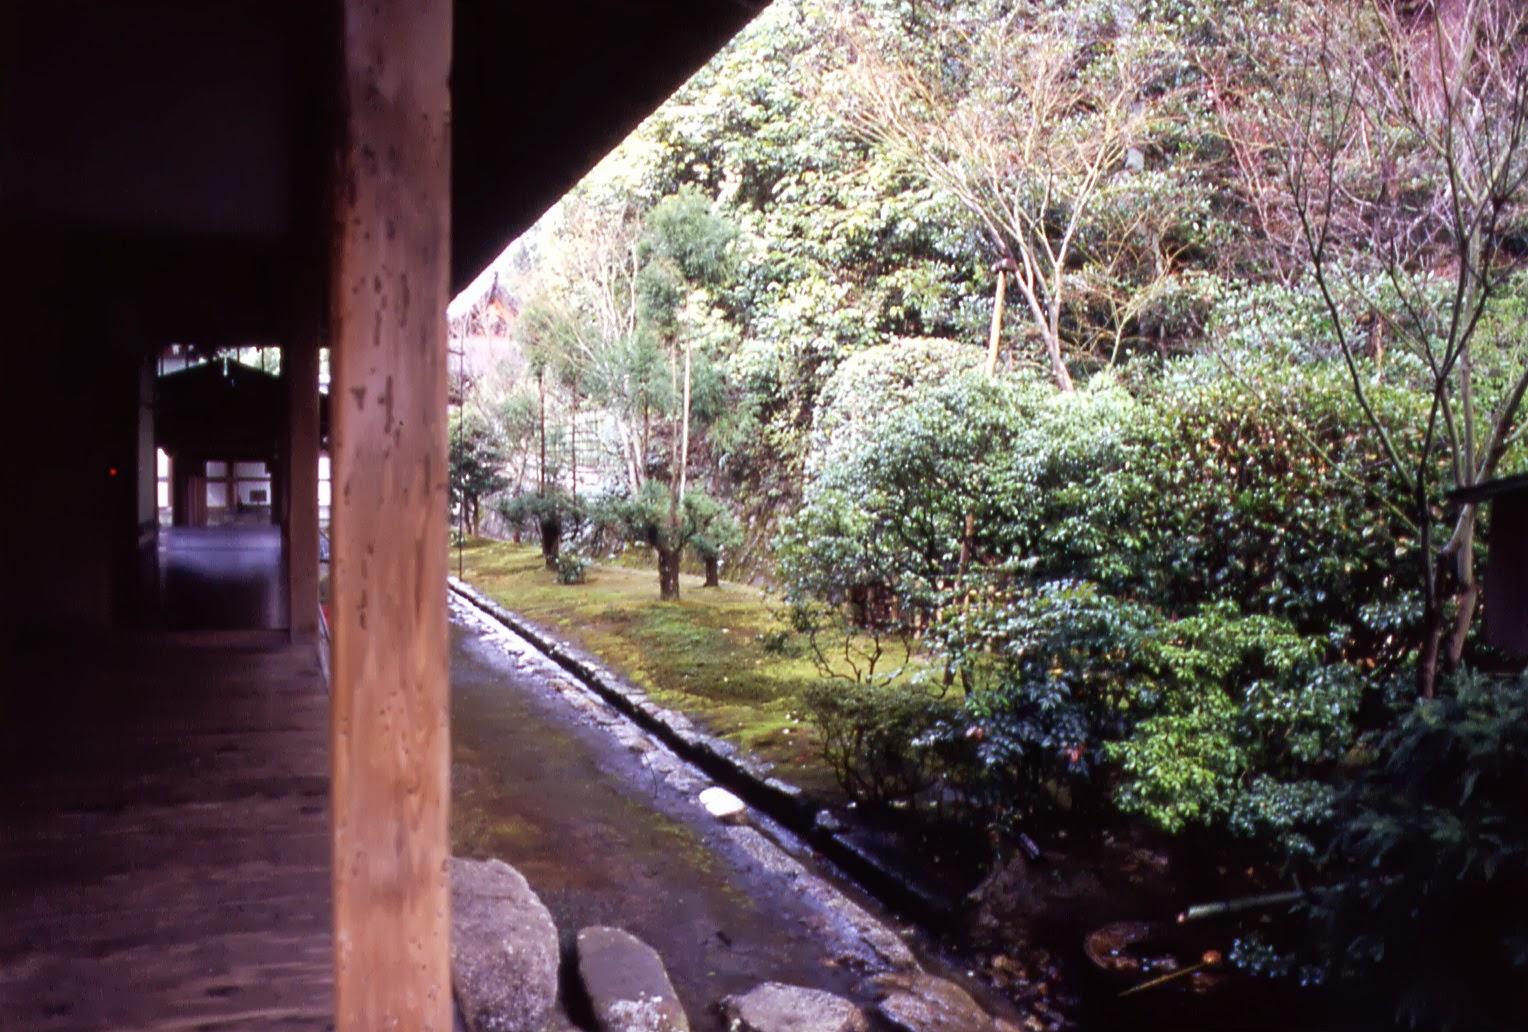 Jap n cultura y arte el jard n japon s el jard n seco o for Jardin umbrio